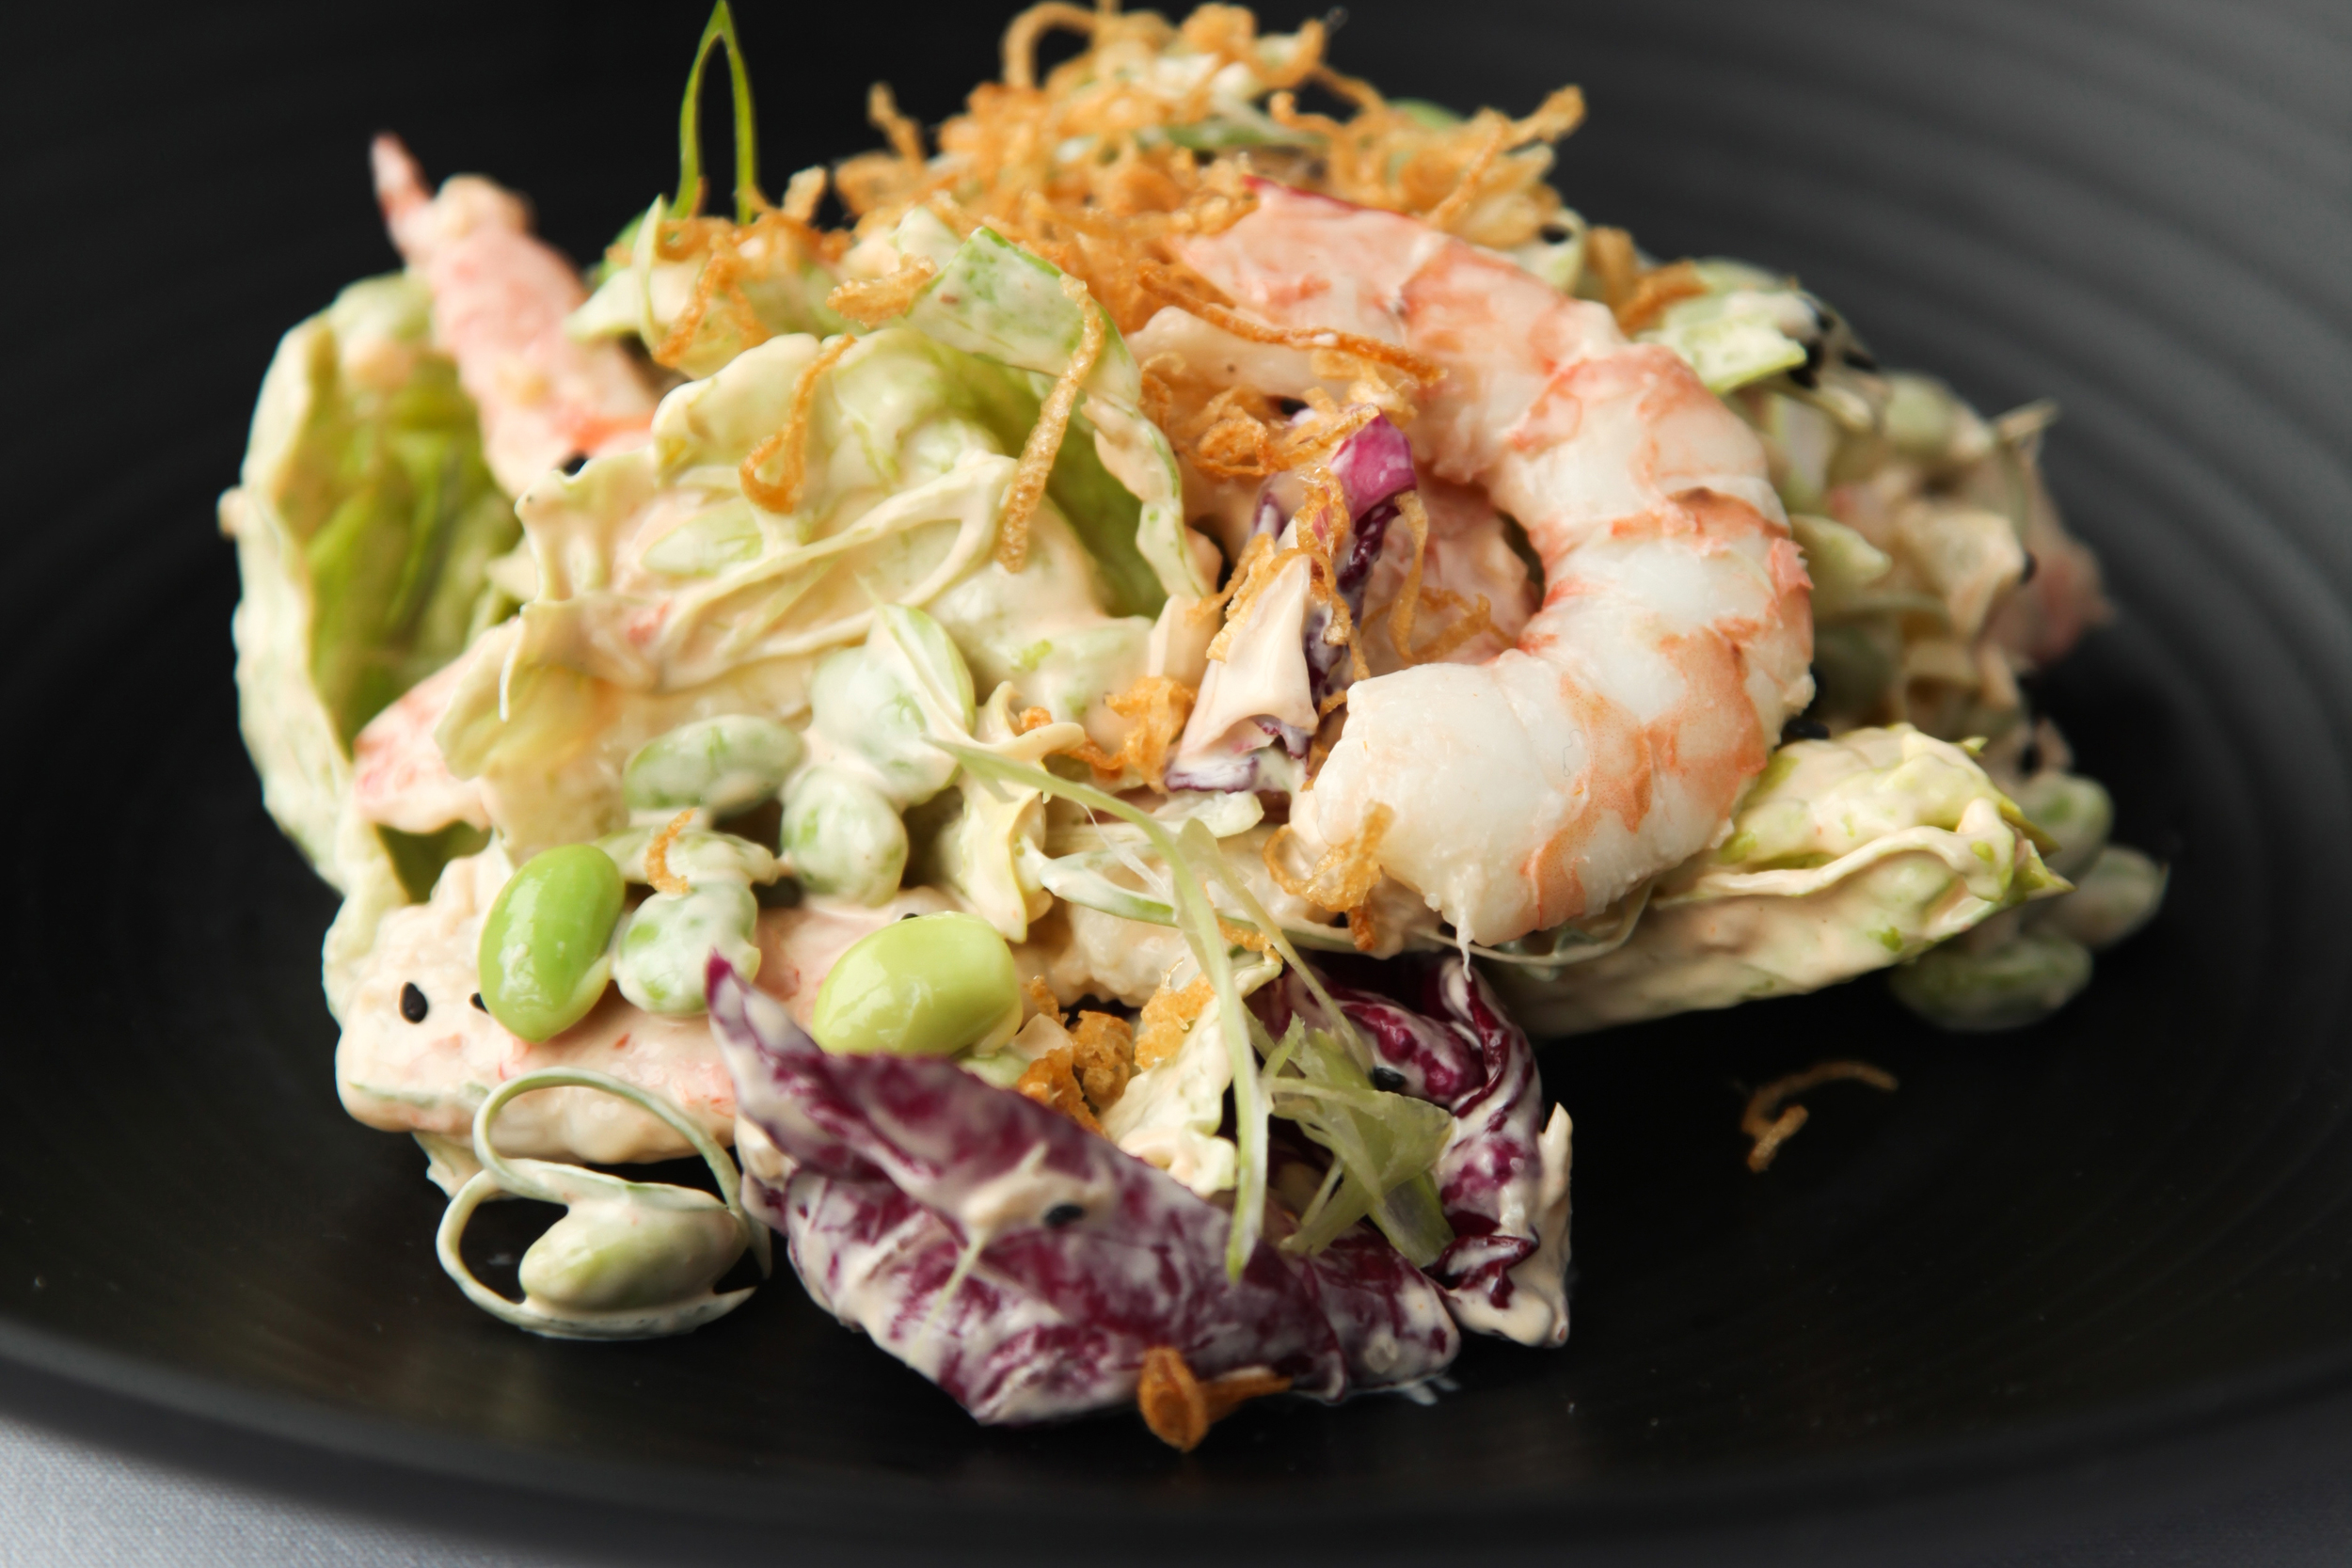 Salad of poached Prawns, iceberg, edamame, spring onion, crispy shallots, Marie Rose dressing & black sesame